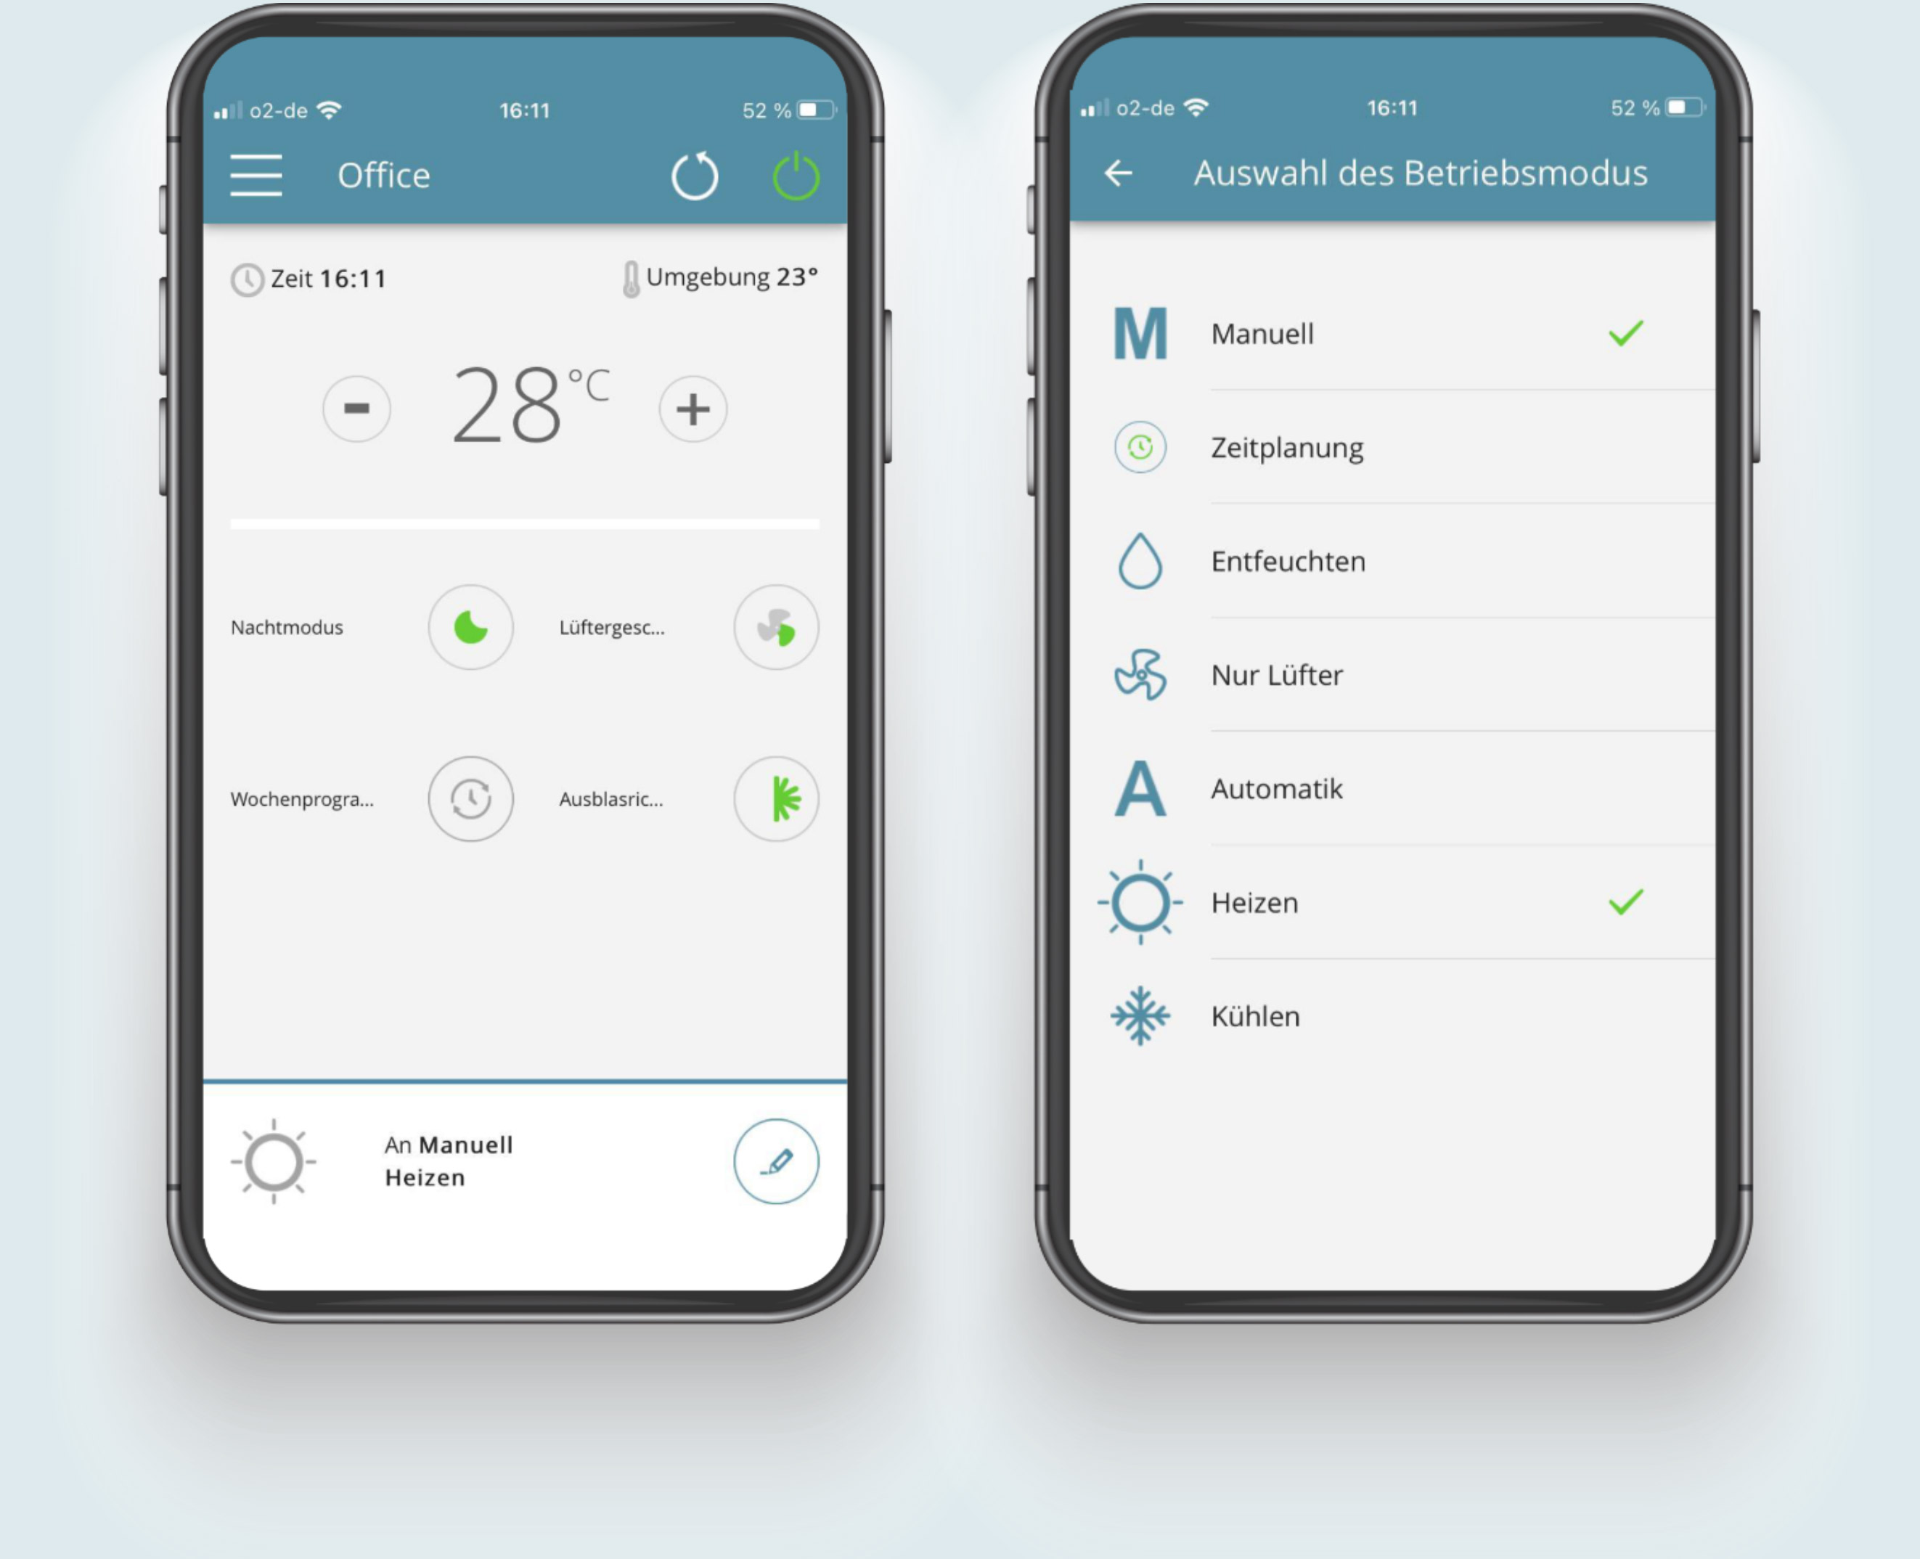 Klimagerät - Steuerung per App